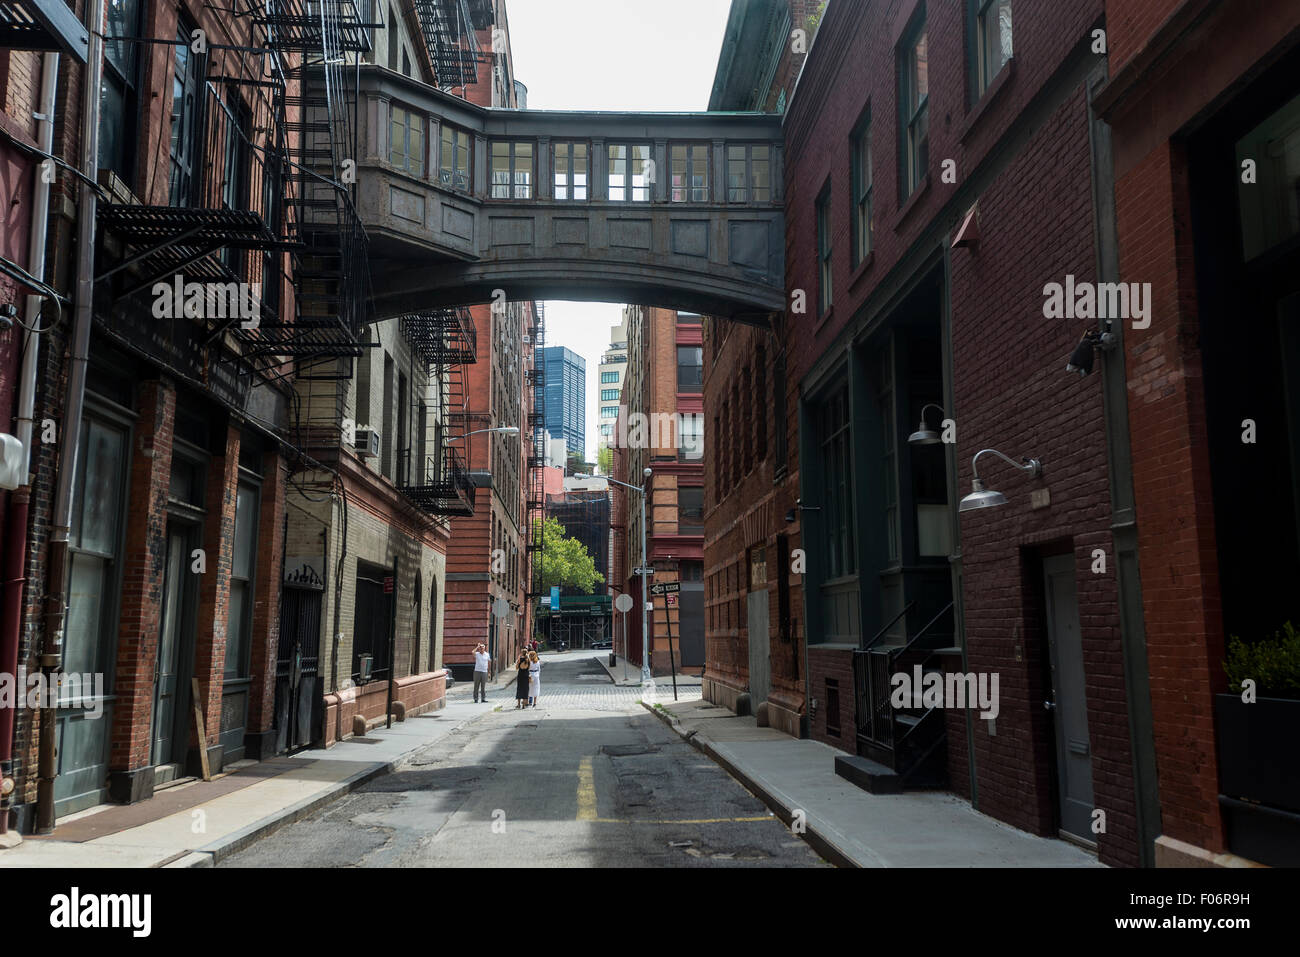 New York, NY - Staple Street with it's skybridge in the TriBeCa neighorhood of Lower Manhattan ©Stacy Walsh Rosenstock/Alamy Stock Photo